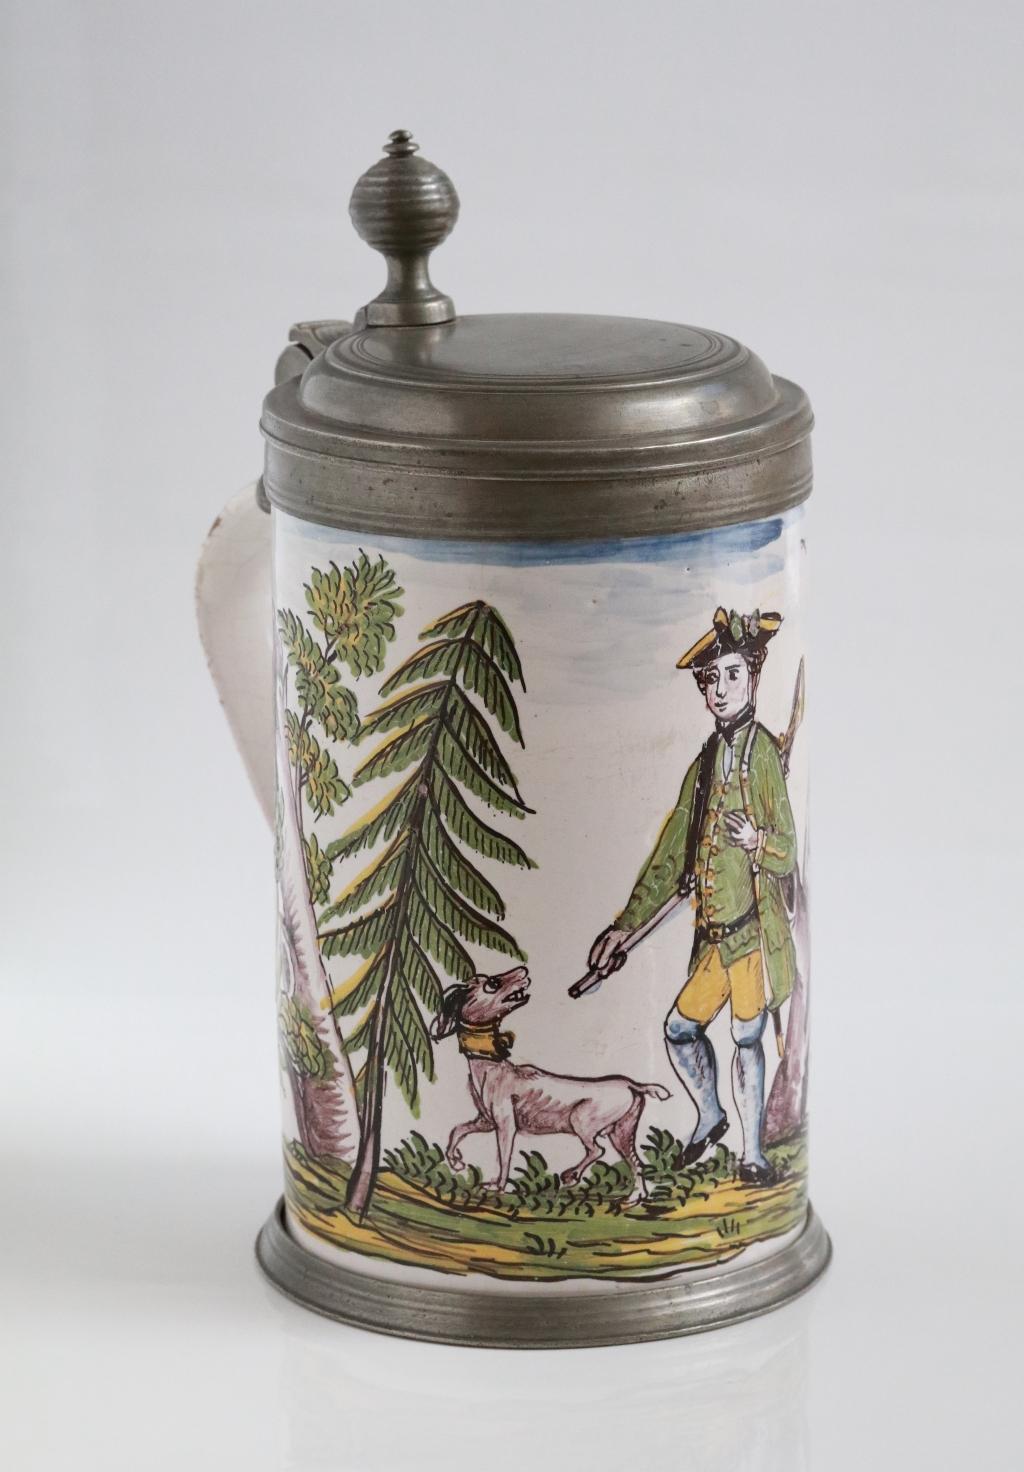 Crailsheimer Fayence Jagdkrug um 1770